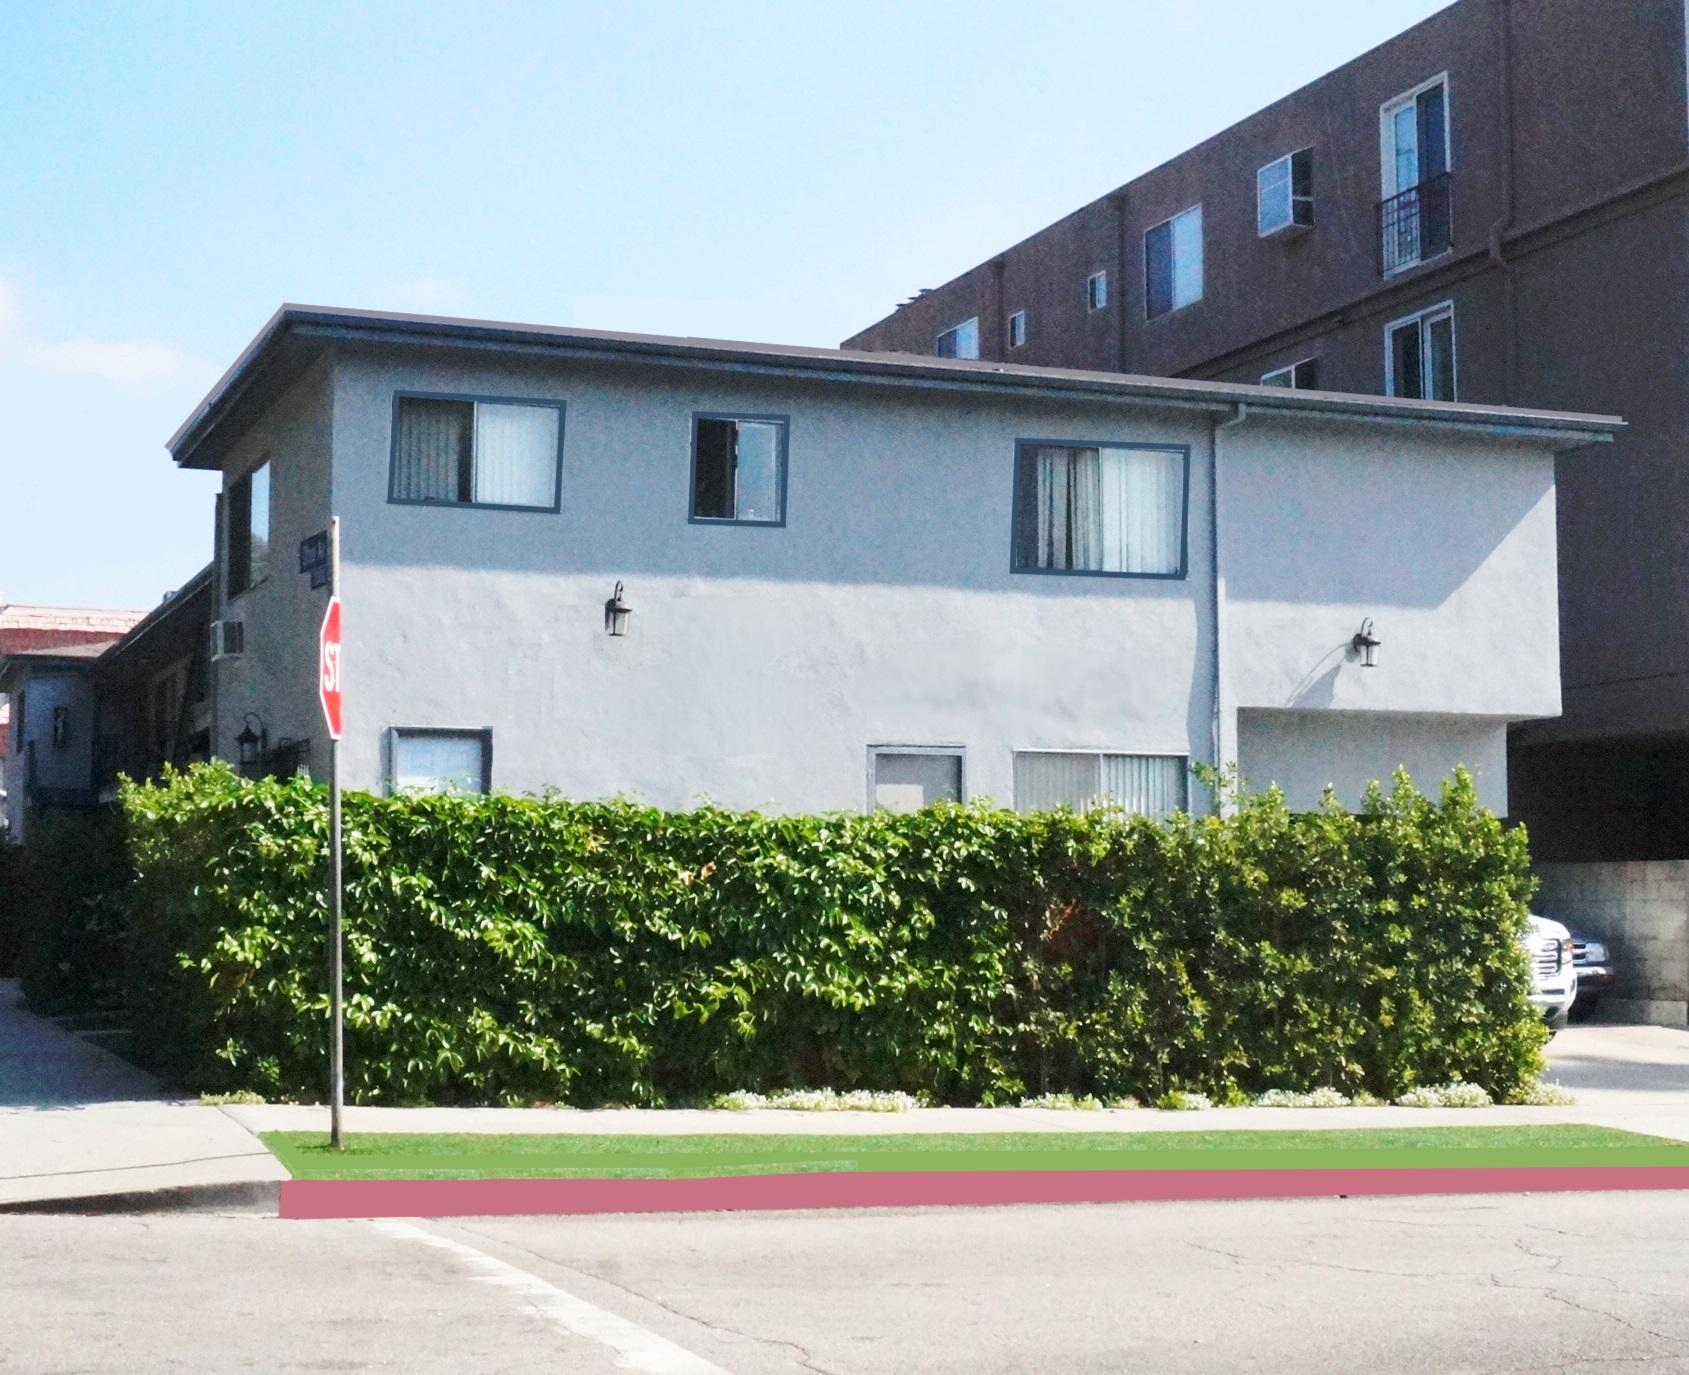 11330 Ohio Ave., Los Angeles, CA 90025